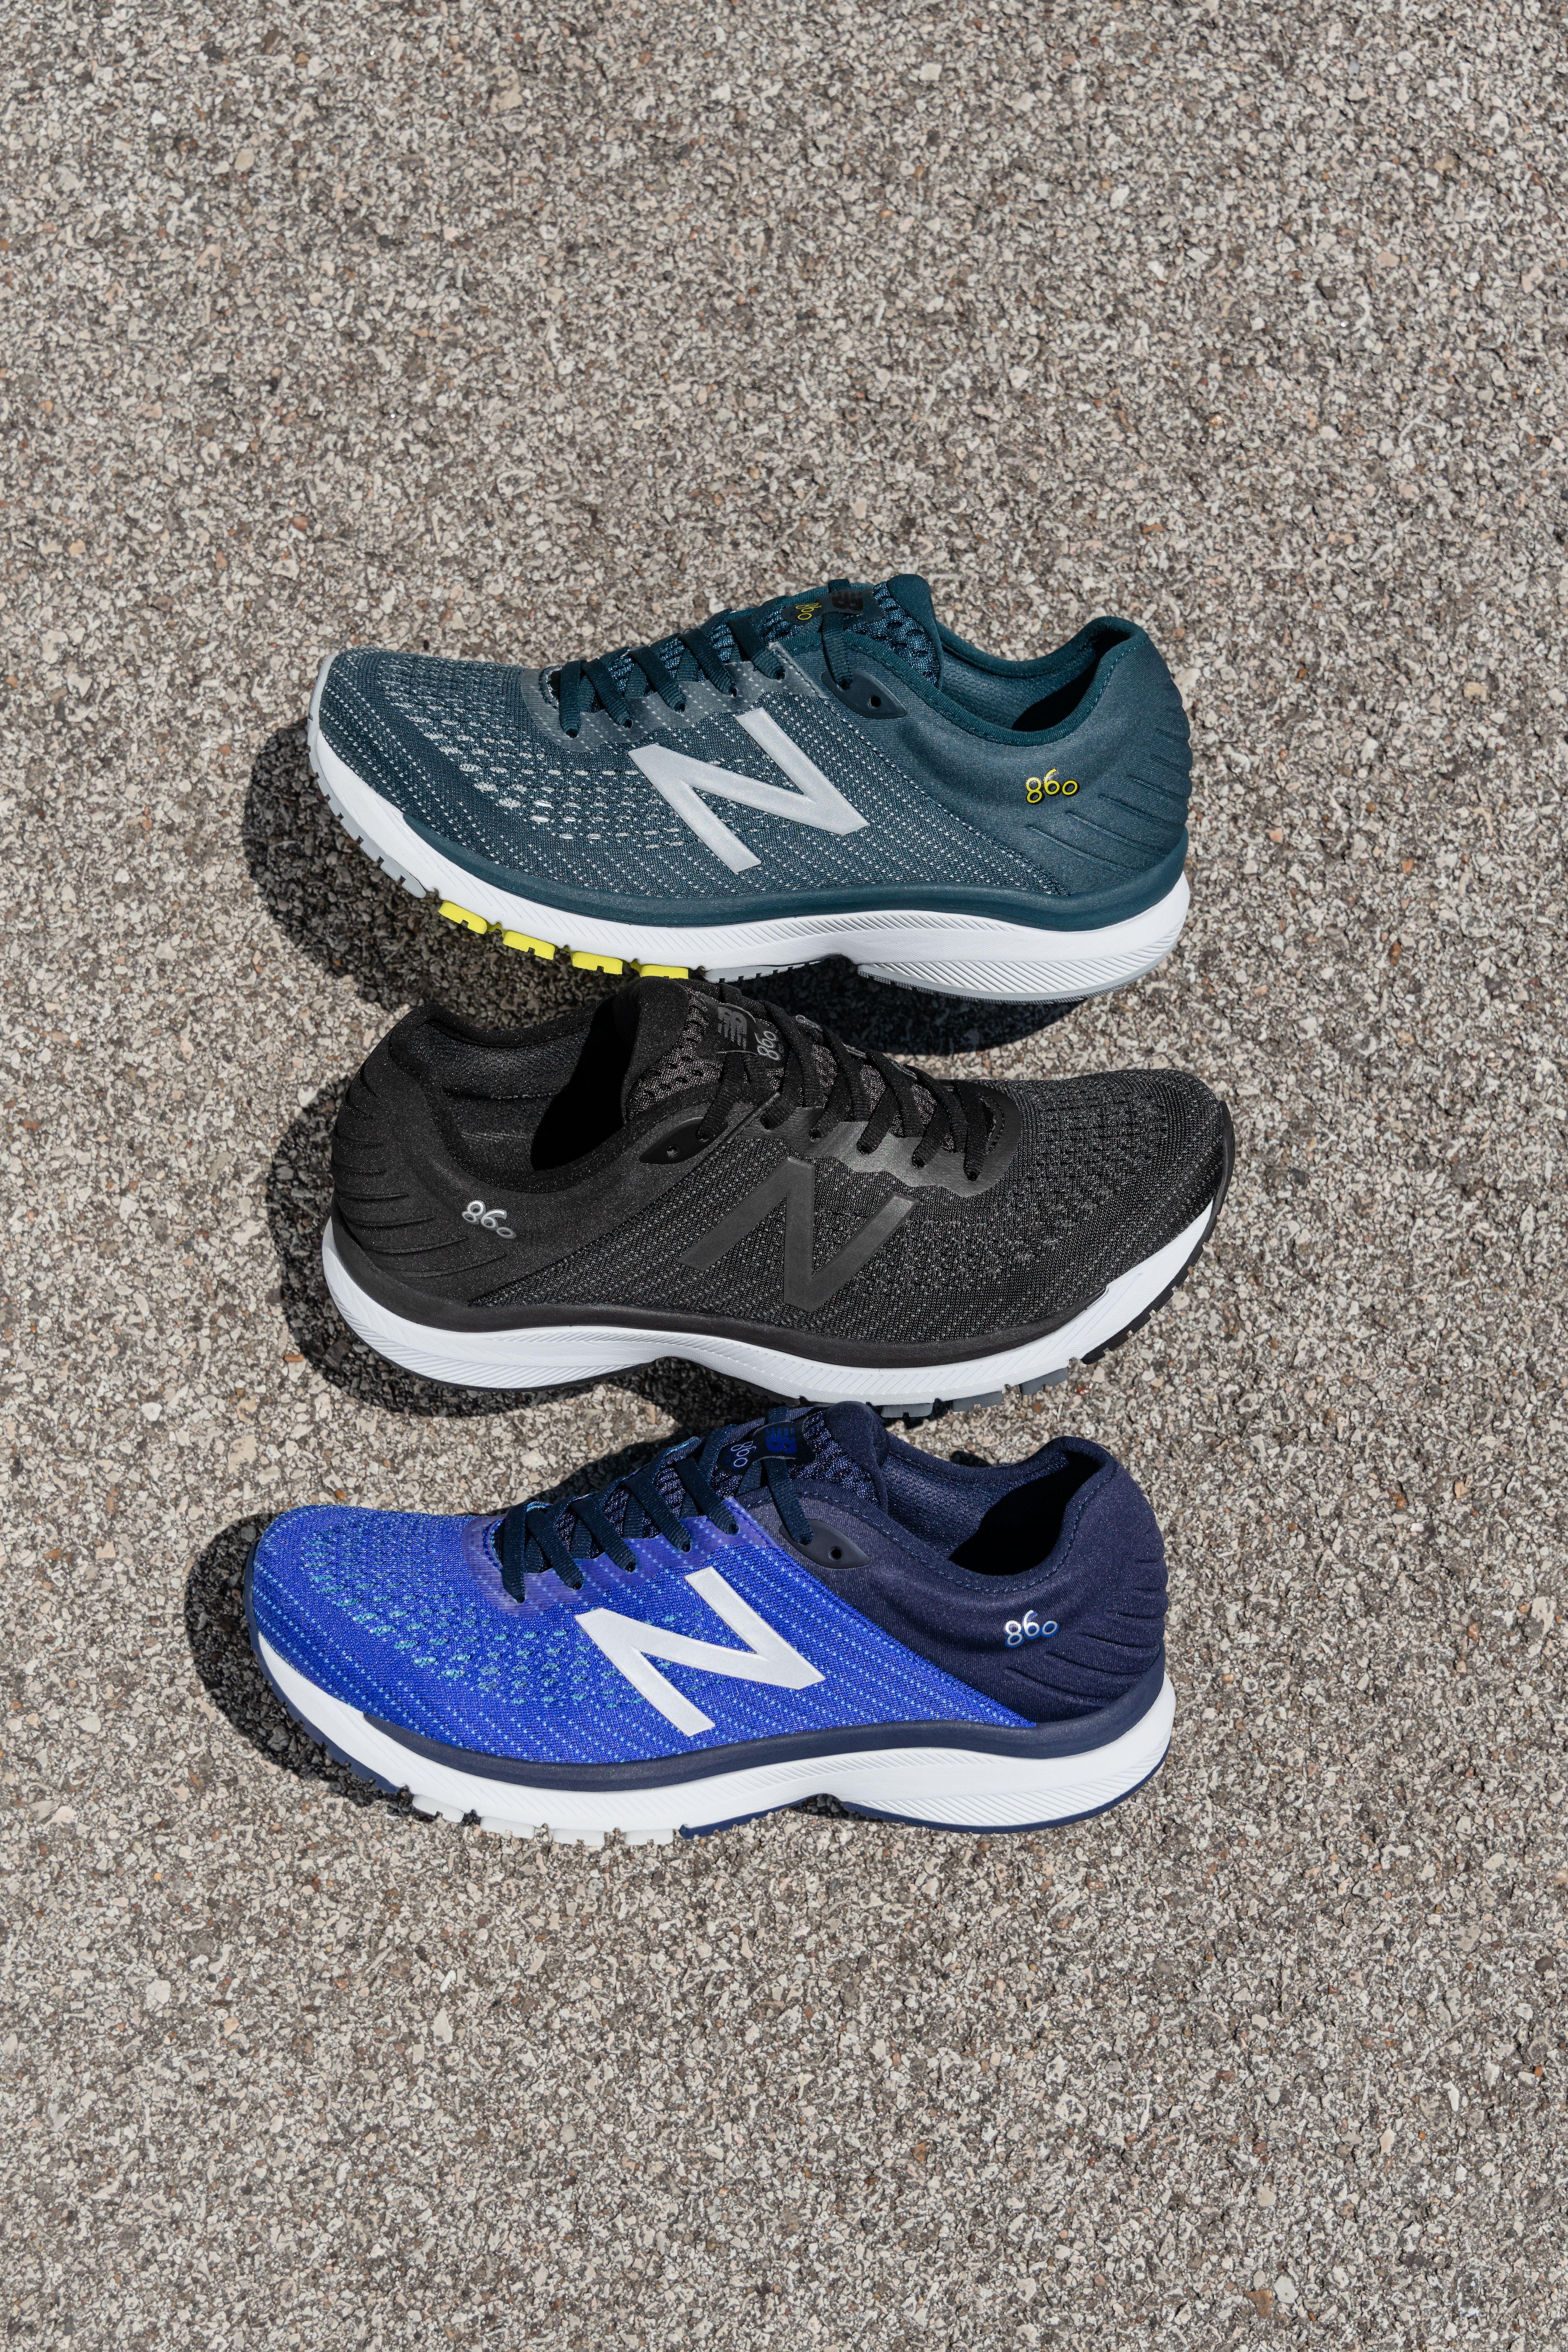 new balance 960